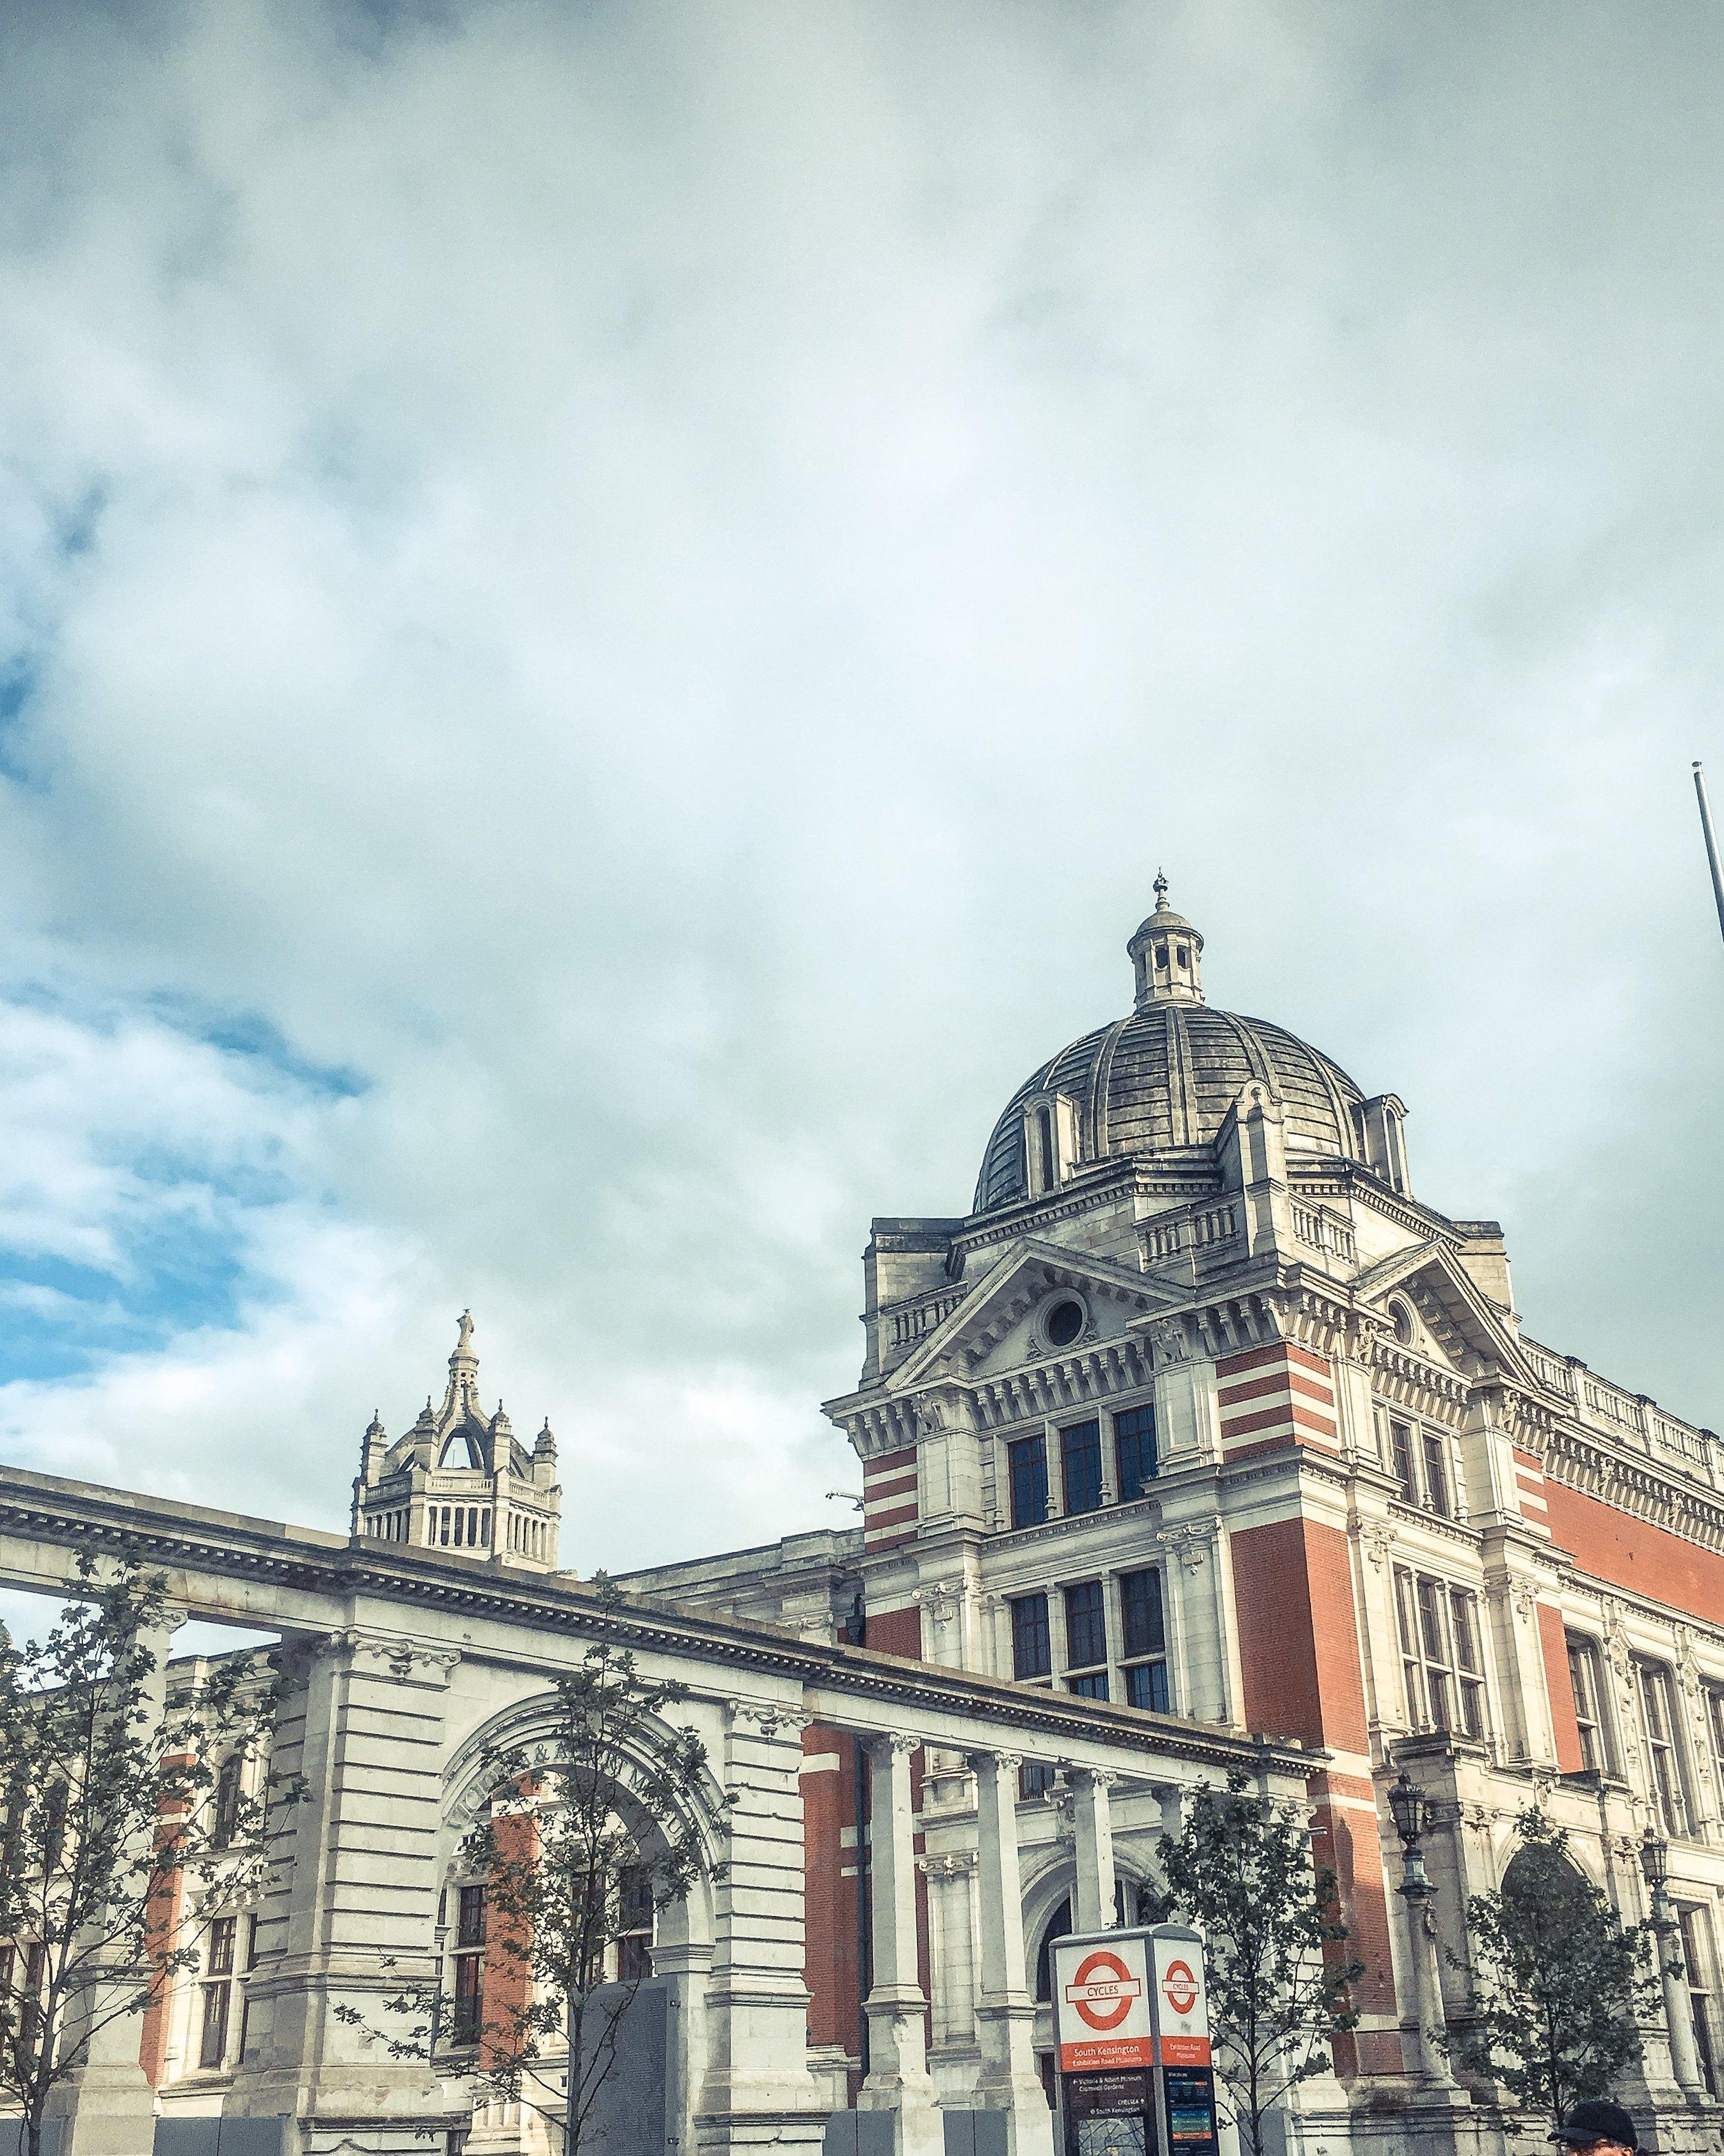 Victoria and Albert museum.